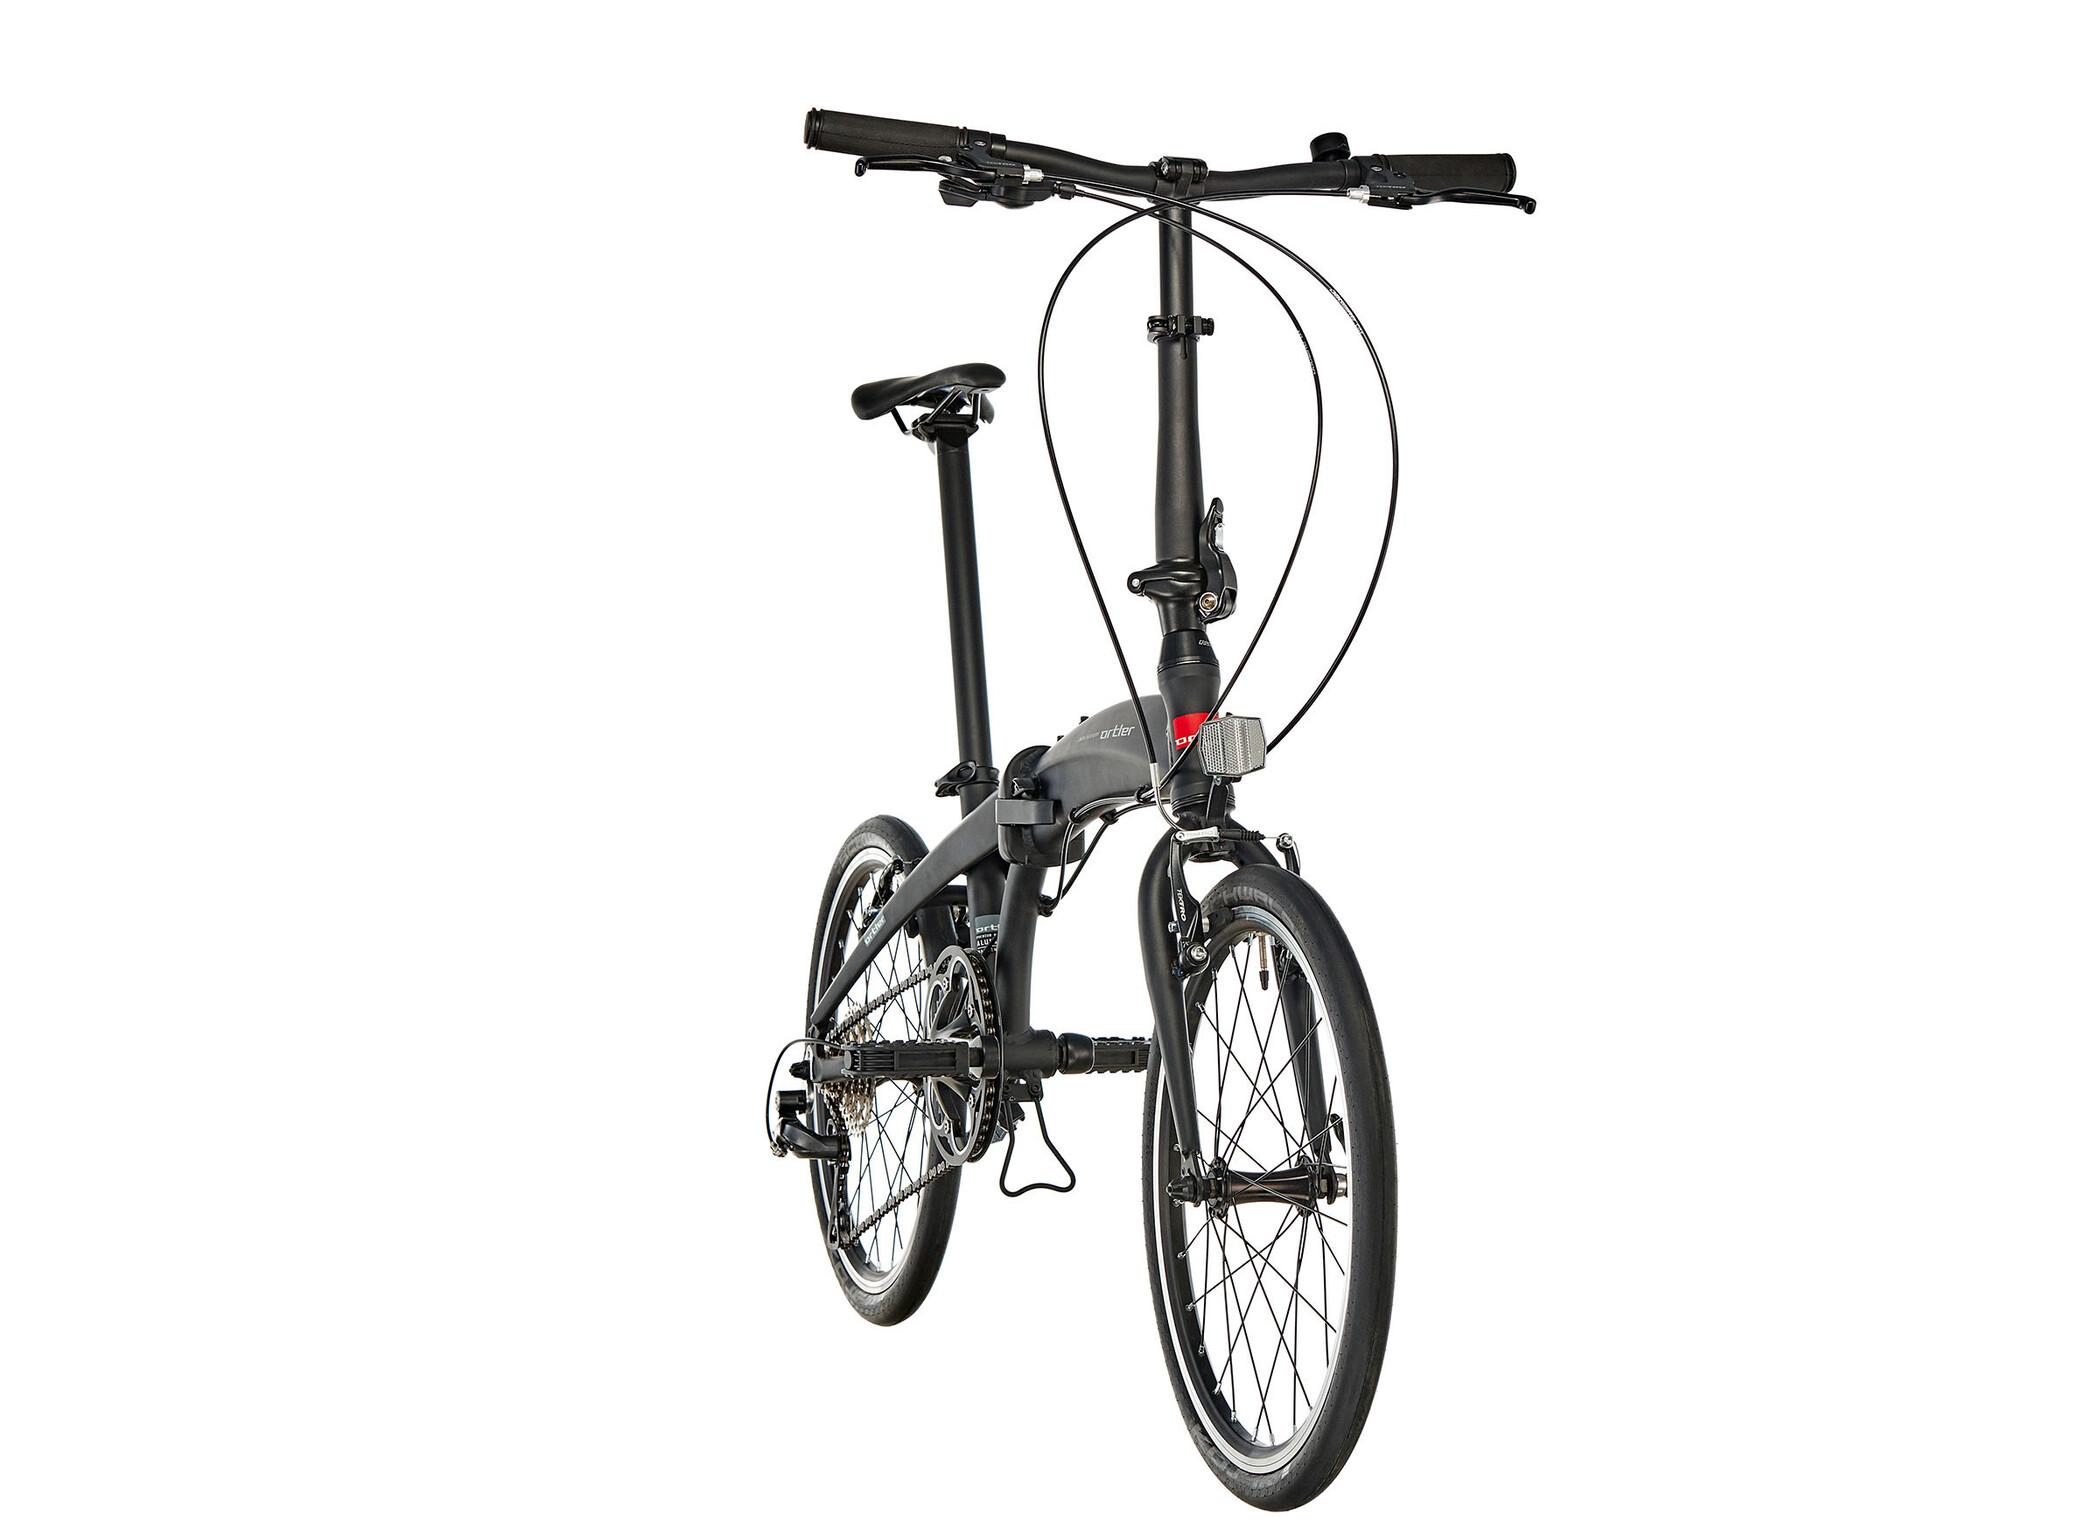 Fahrrder Radsport byom.it Ortler London Race 20 Black 2019 Faltrad